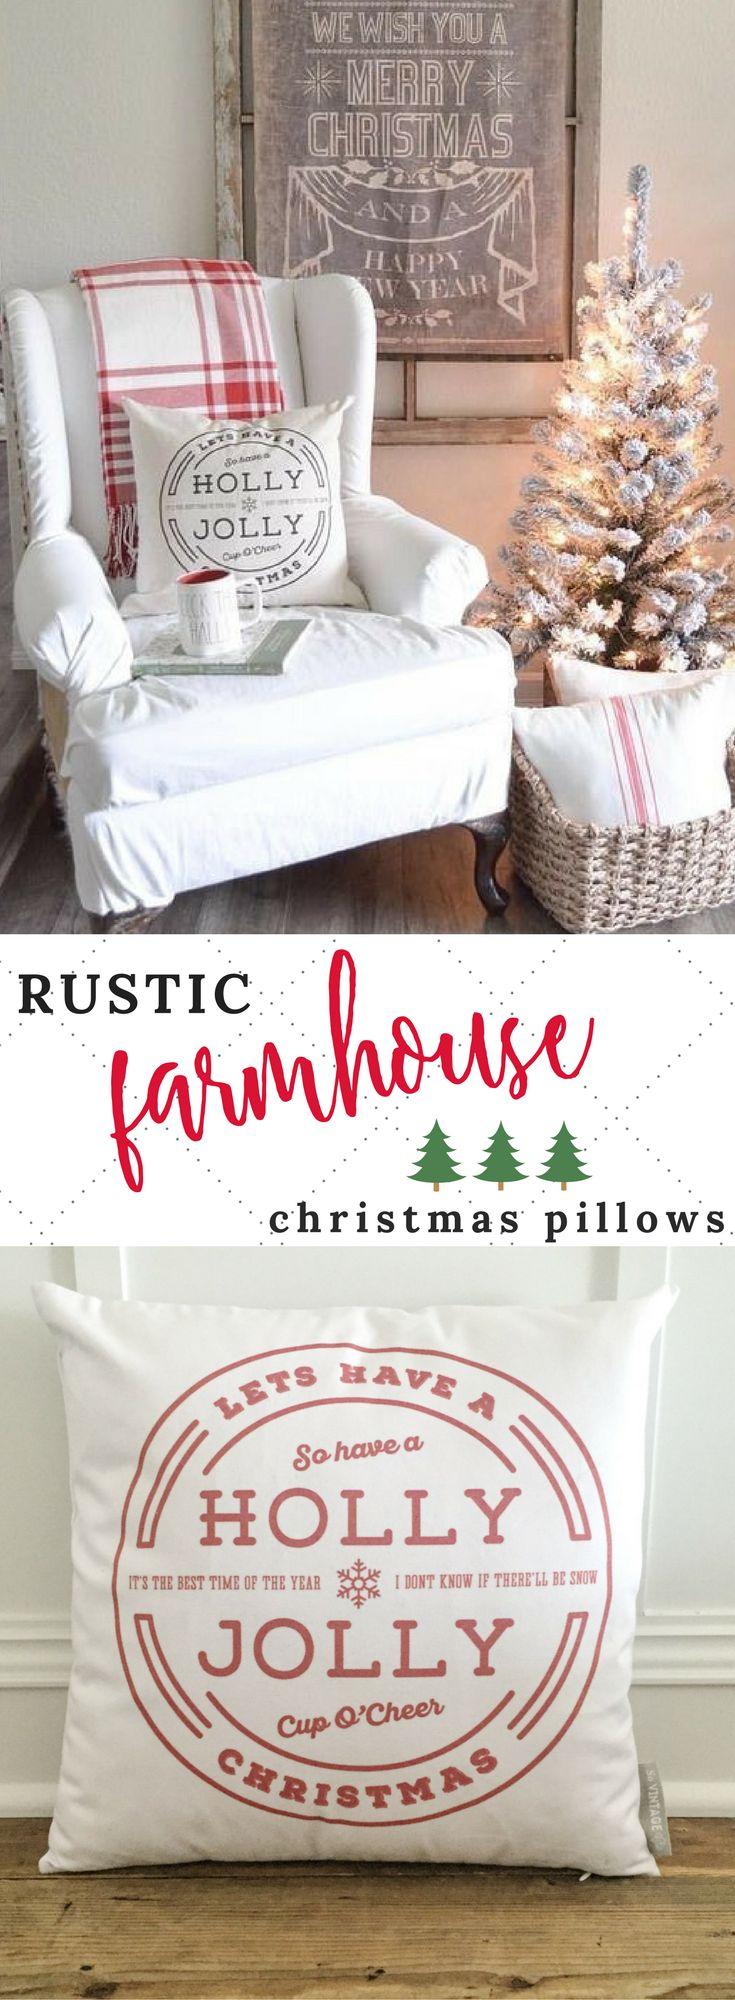 300 best Christmas images on Pinterest | Christmas decor, Christmas ...